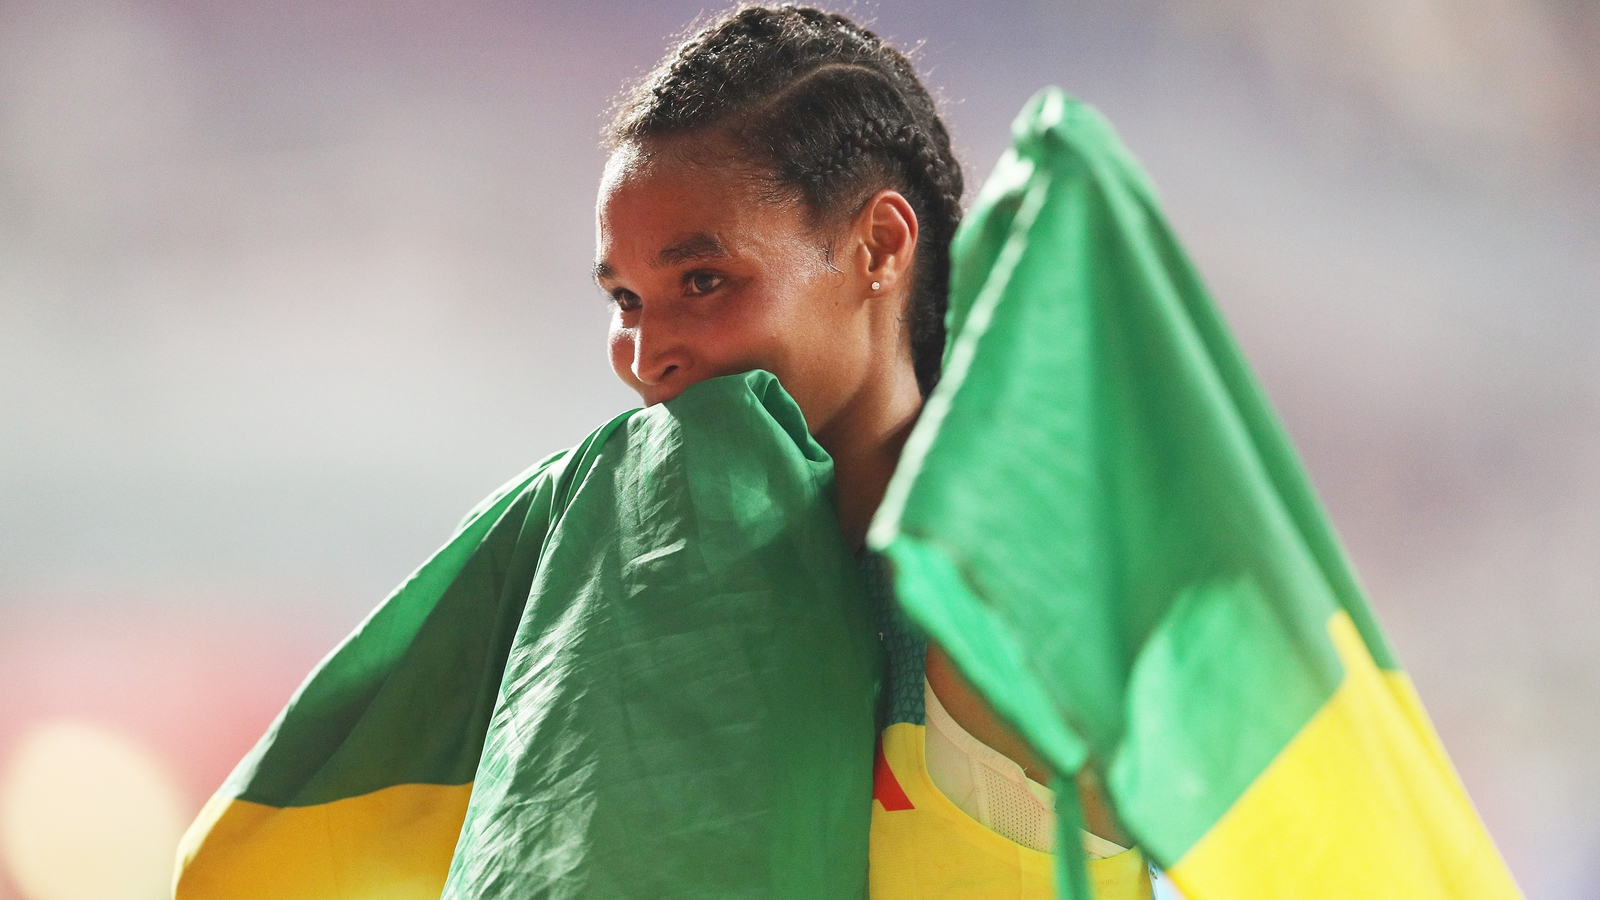 Ethiopia's Gidey breaks half marathon world record